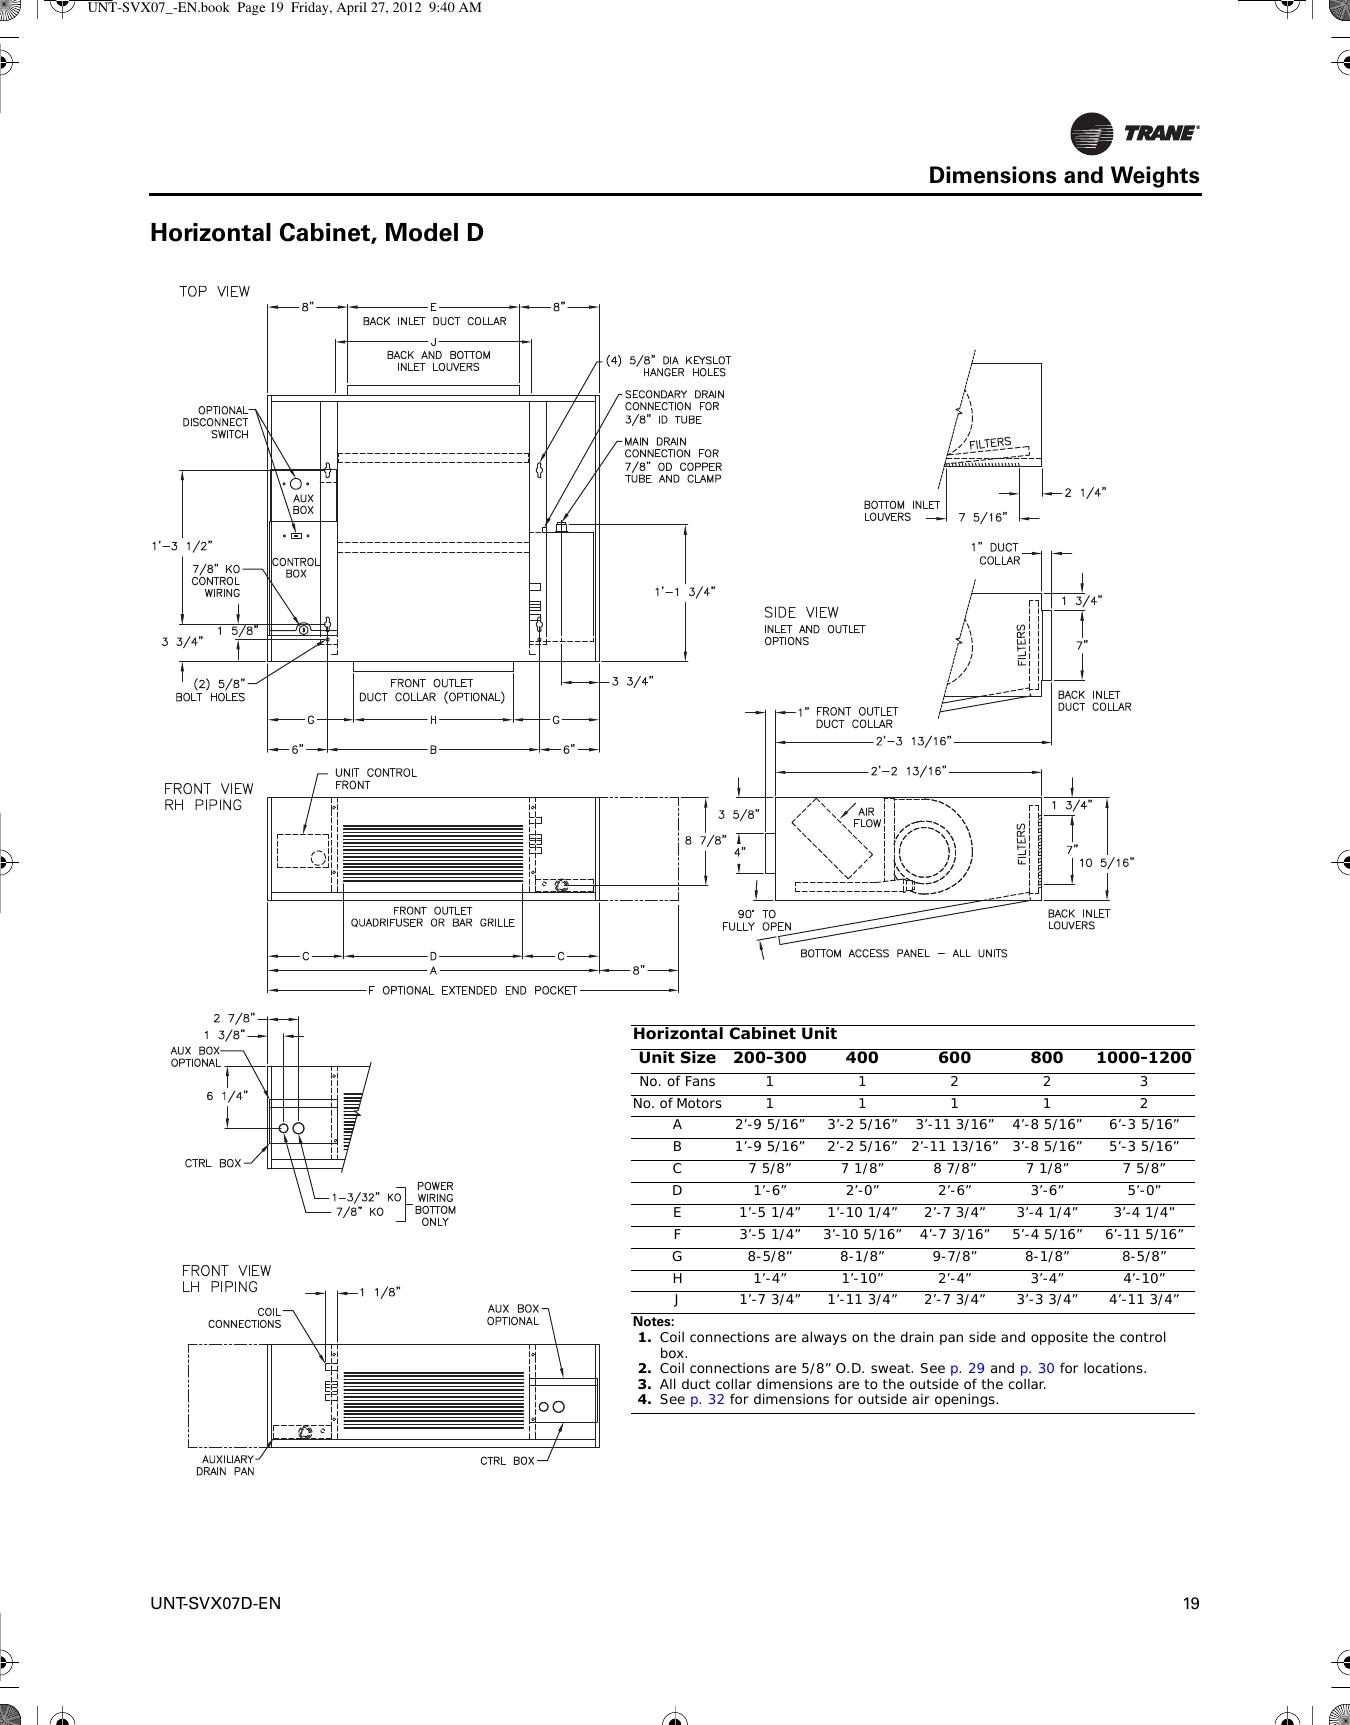 trane uni fan coil and force flo installation maintenance  uc400 trane wiring diagram #9